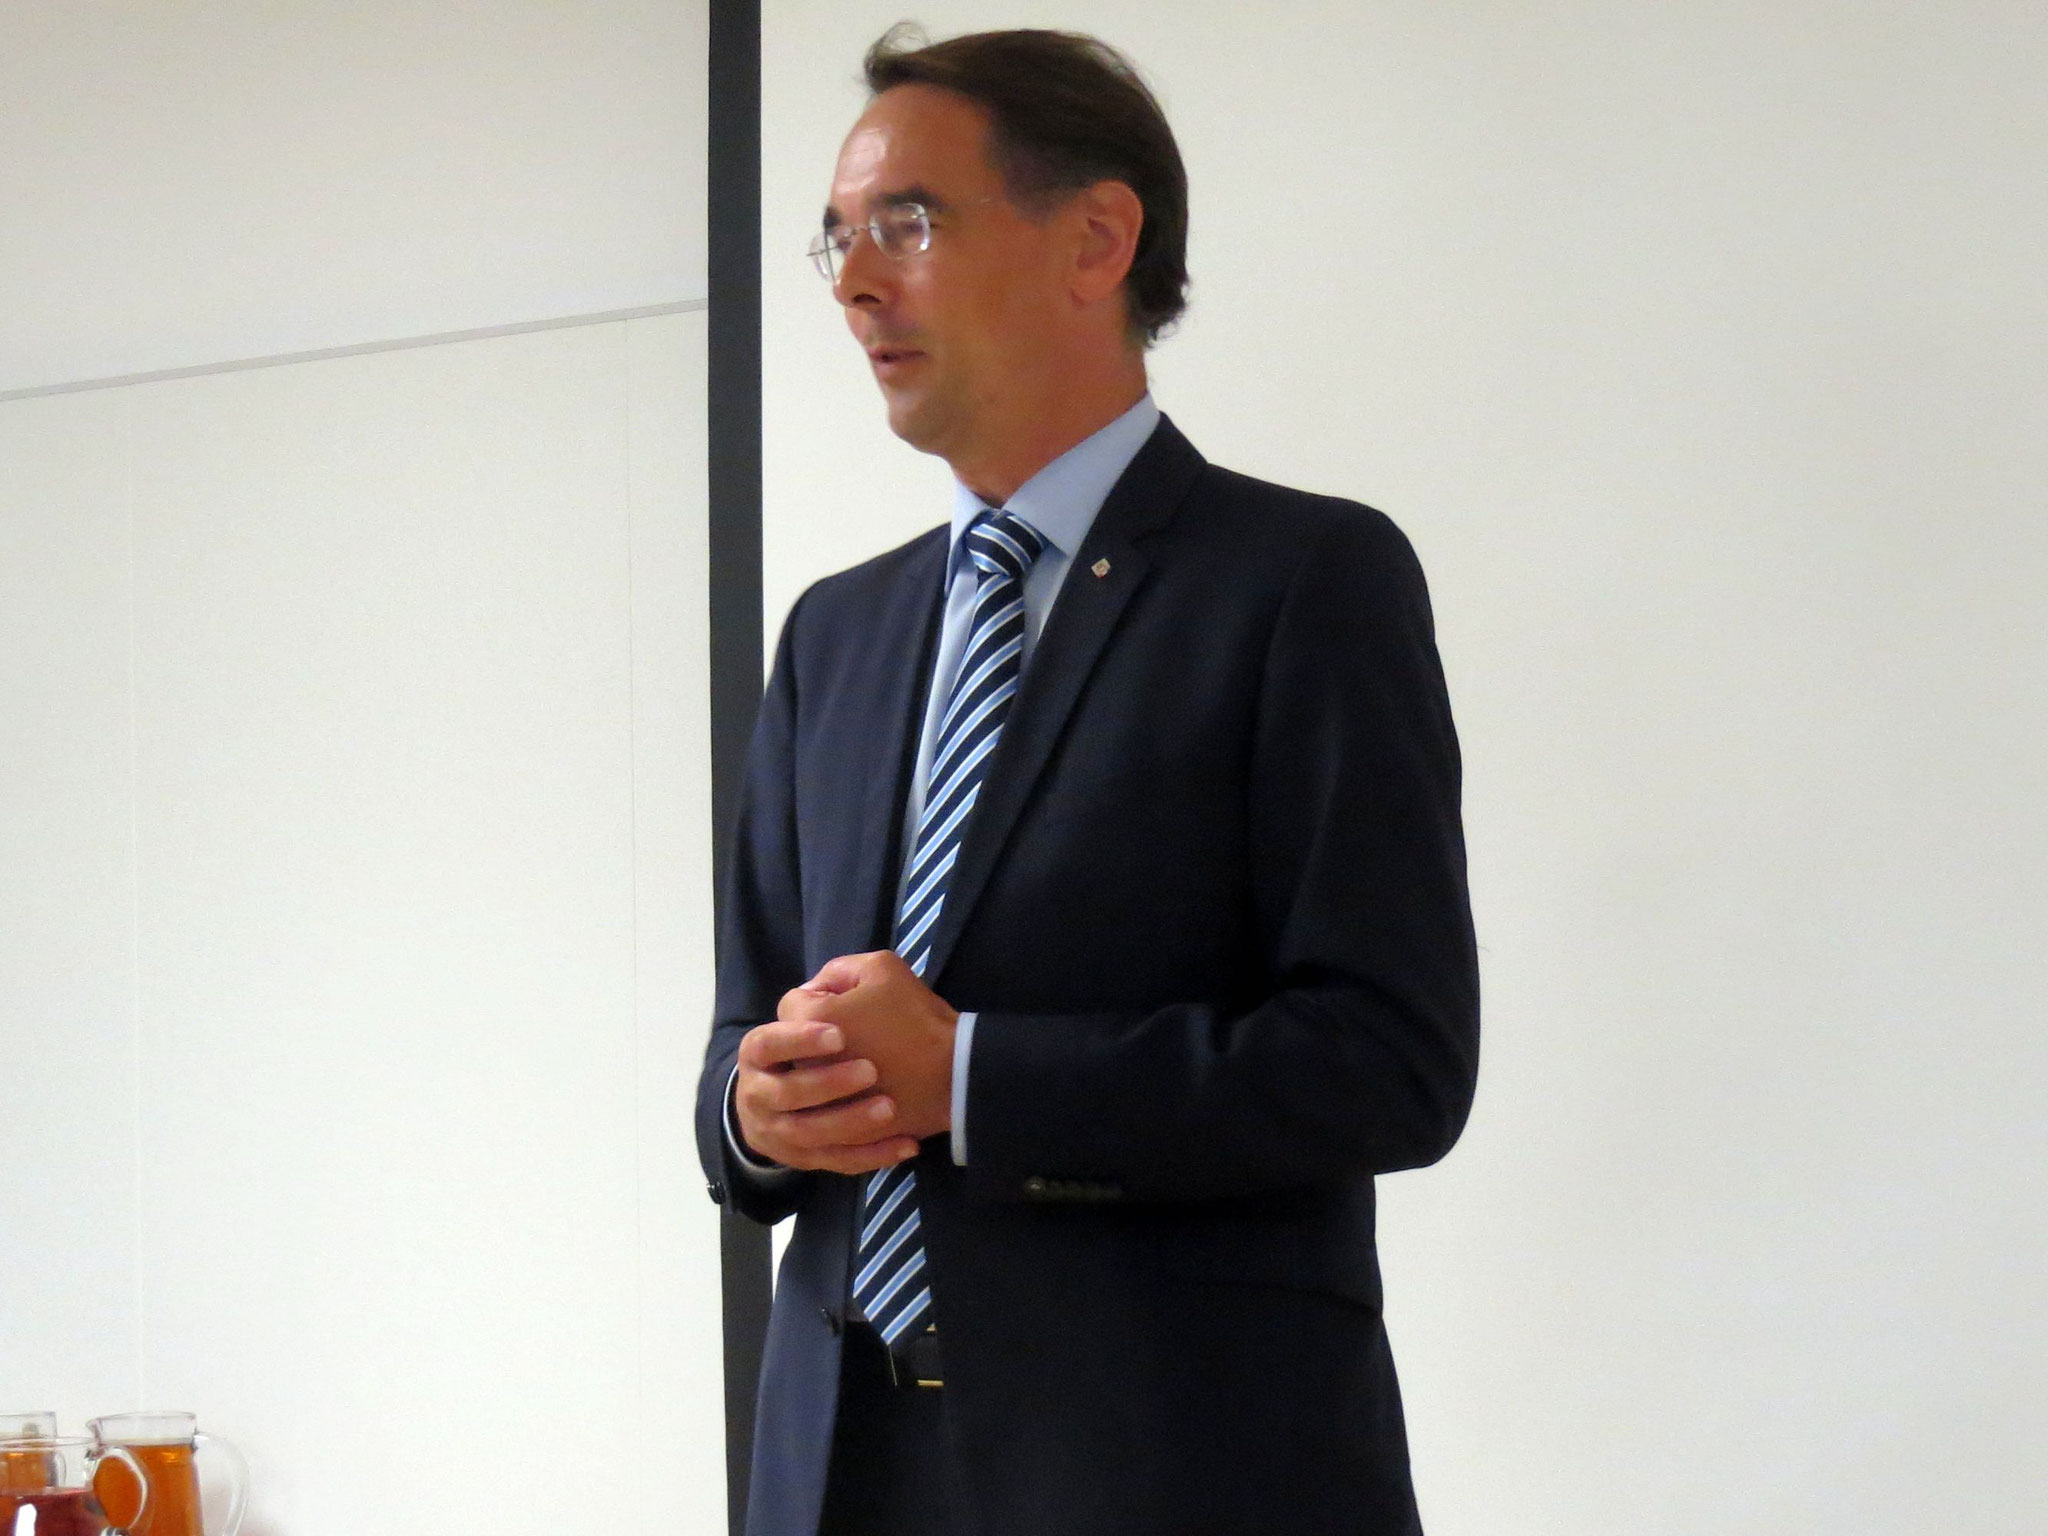 Ingbert Liebing MdB und